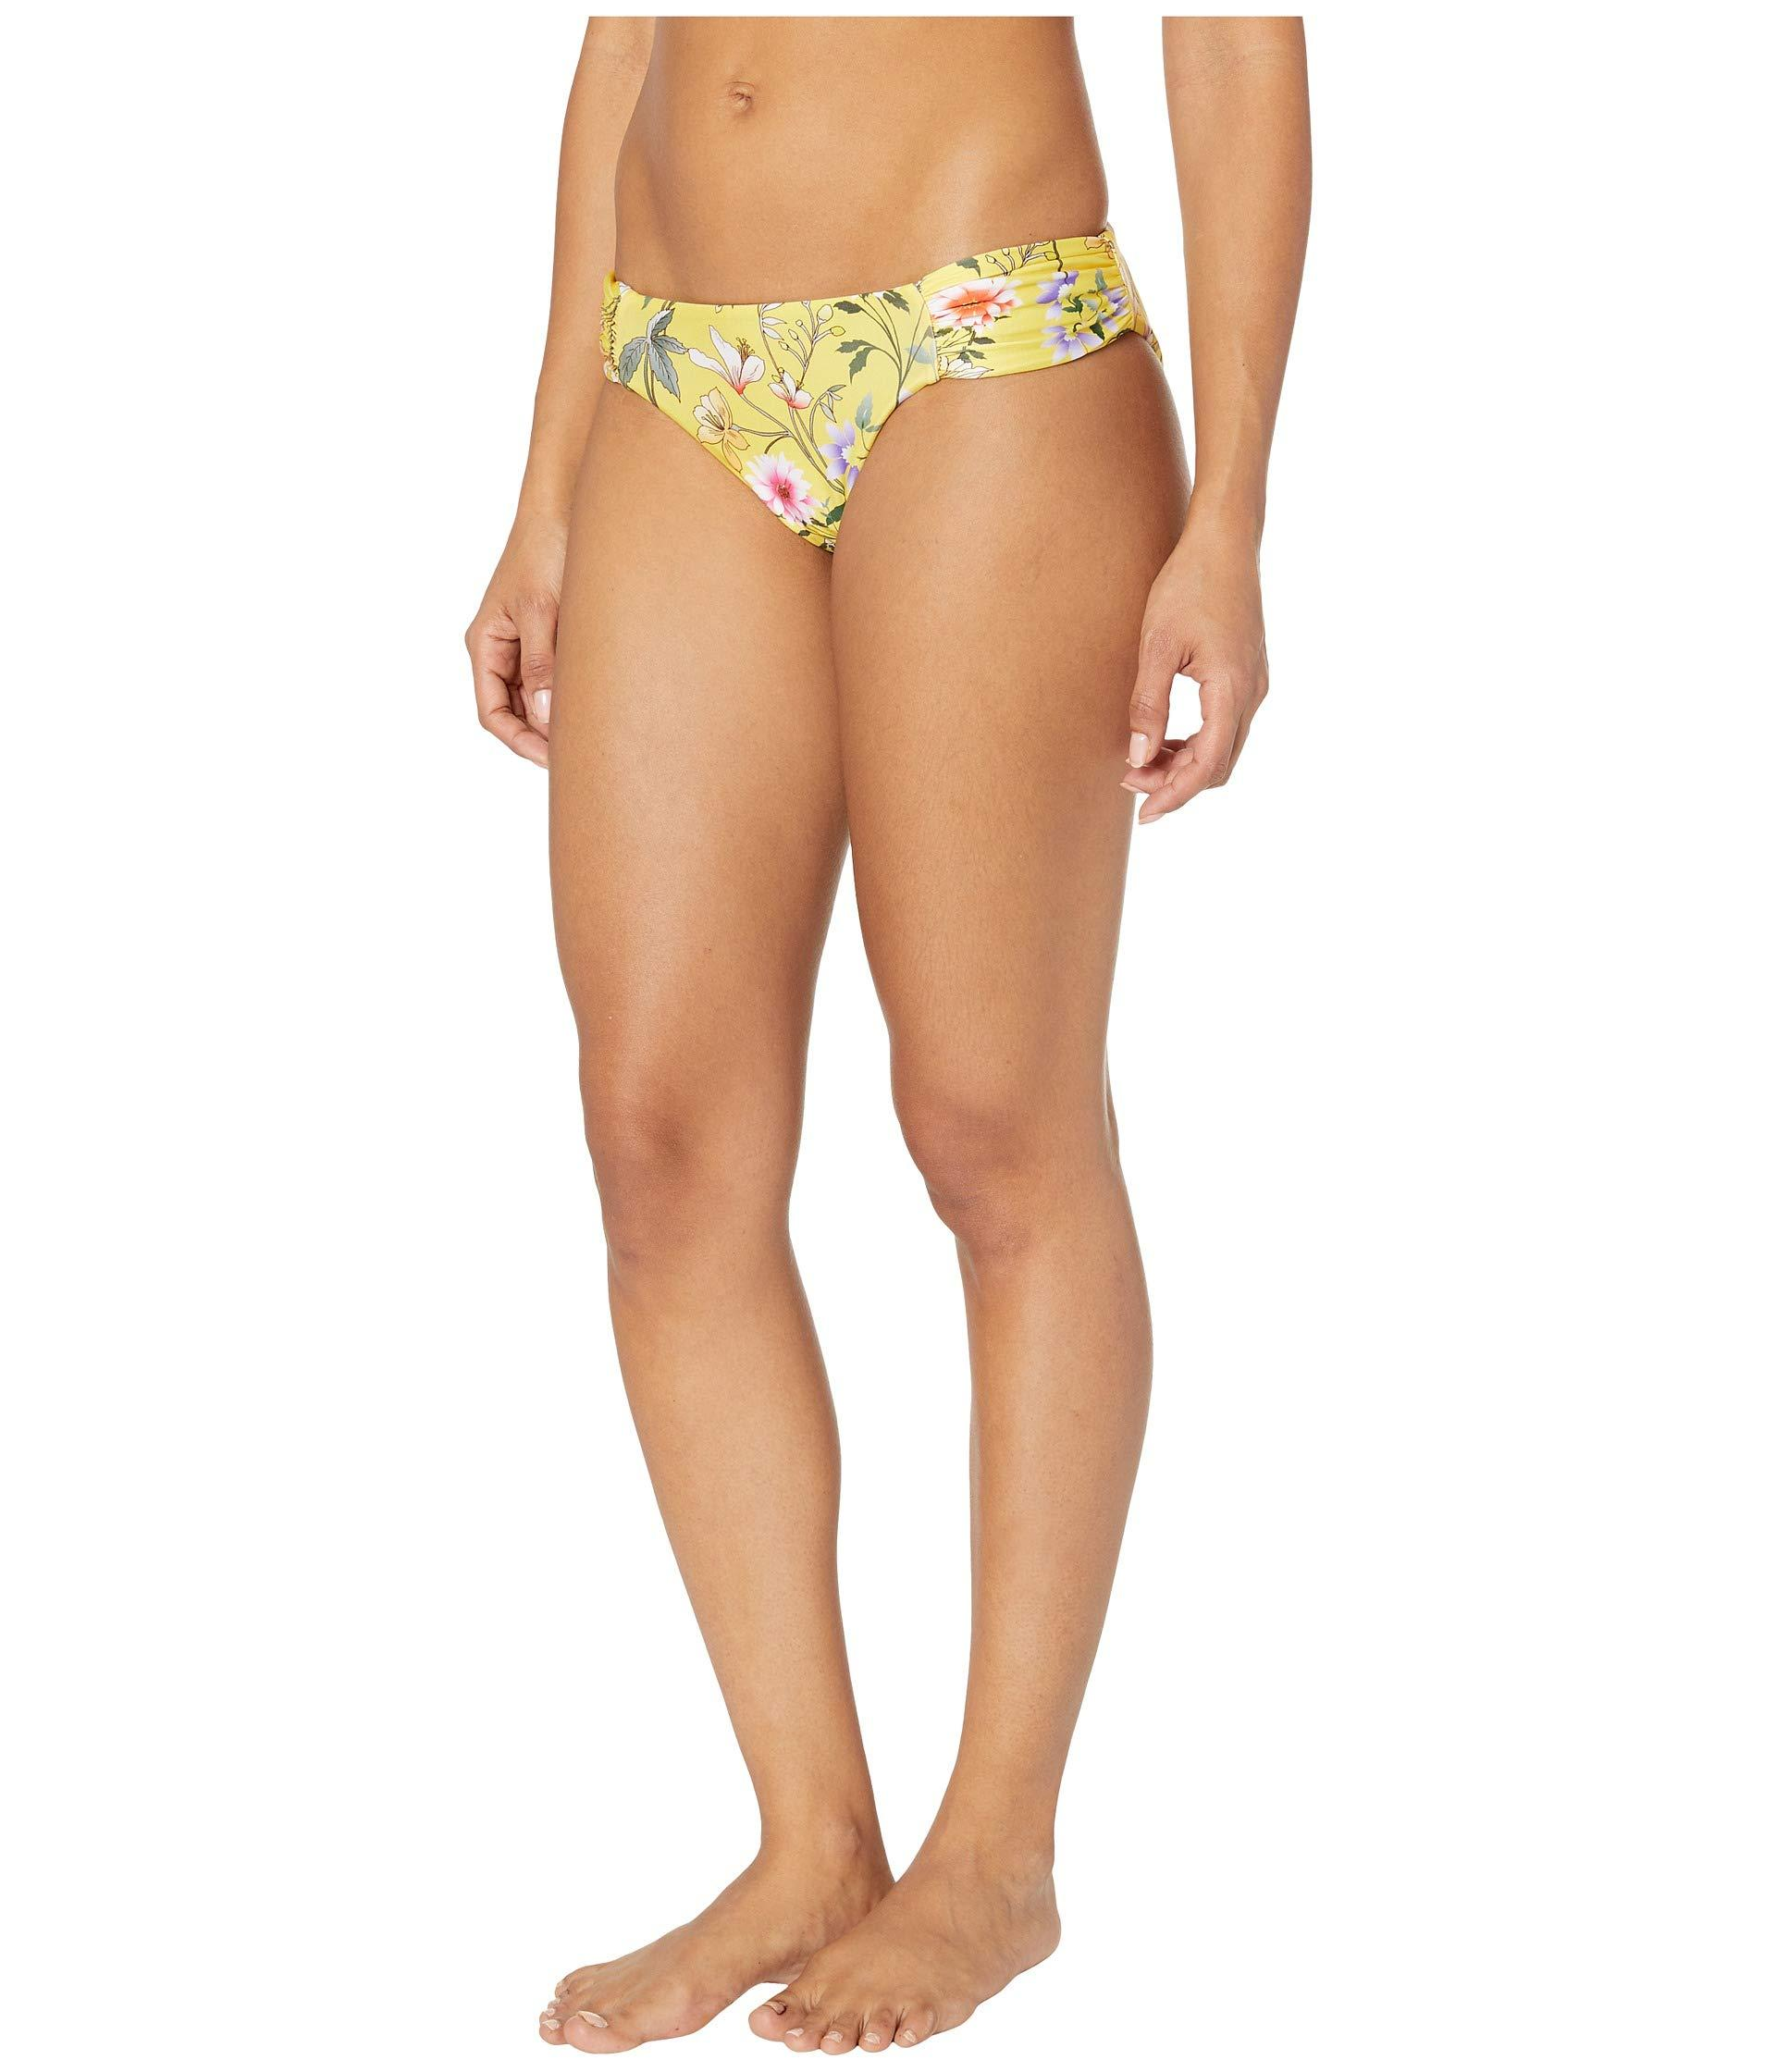 74898150b1917 Lyst - Lucky Brand Cruisin Coronado Reversible Side Shirred Pant Bottoms  (multi) Women's Swimwear